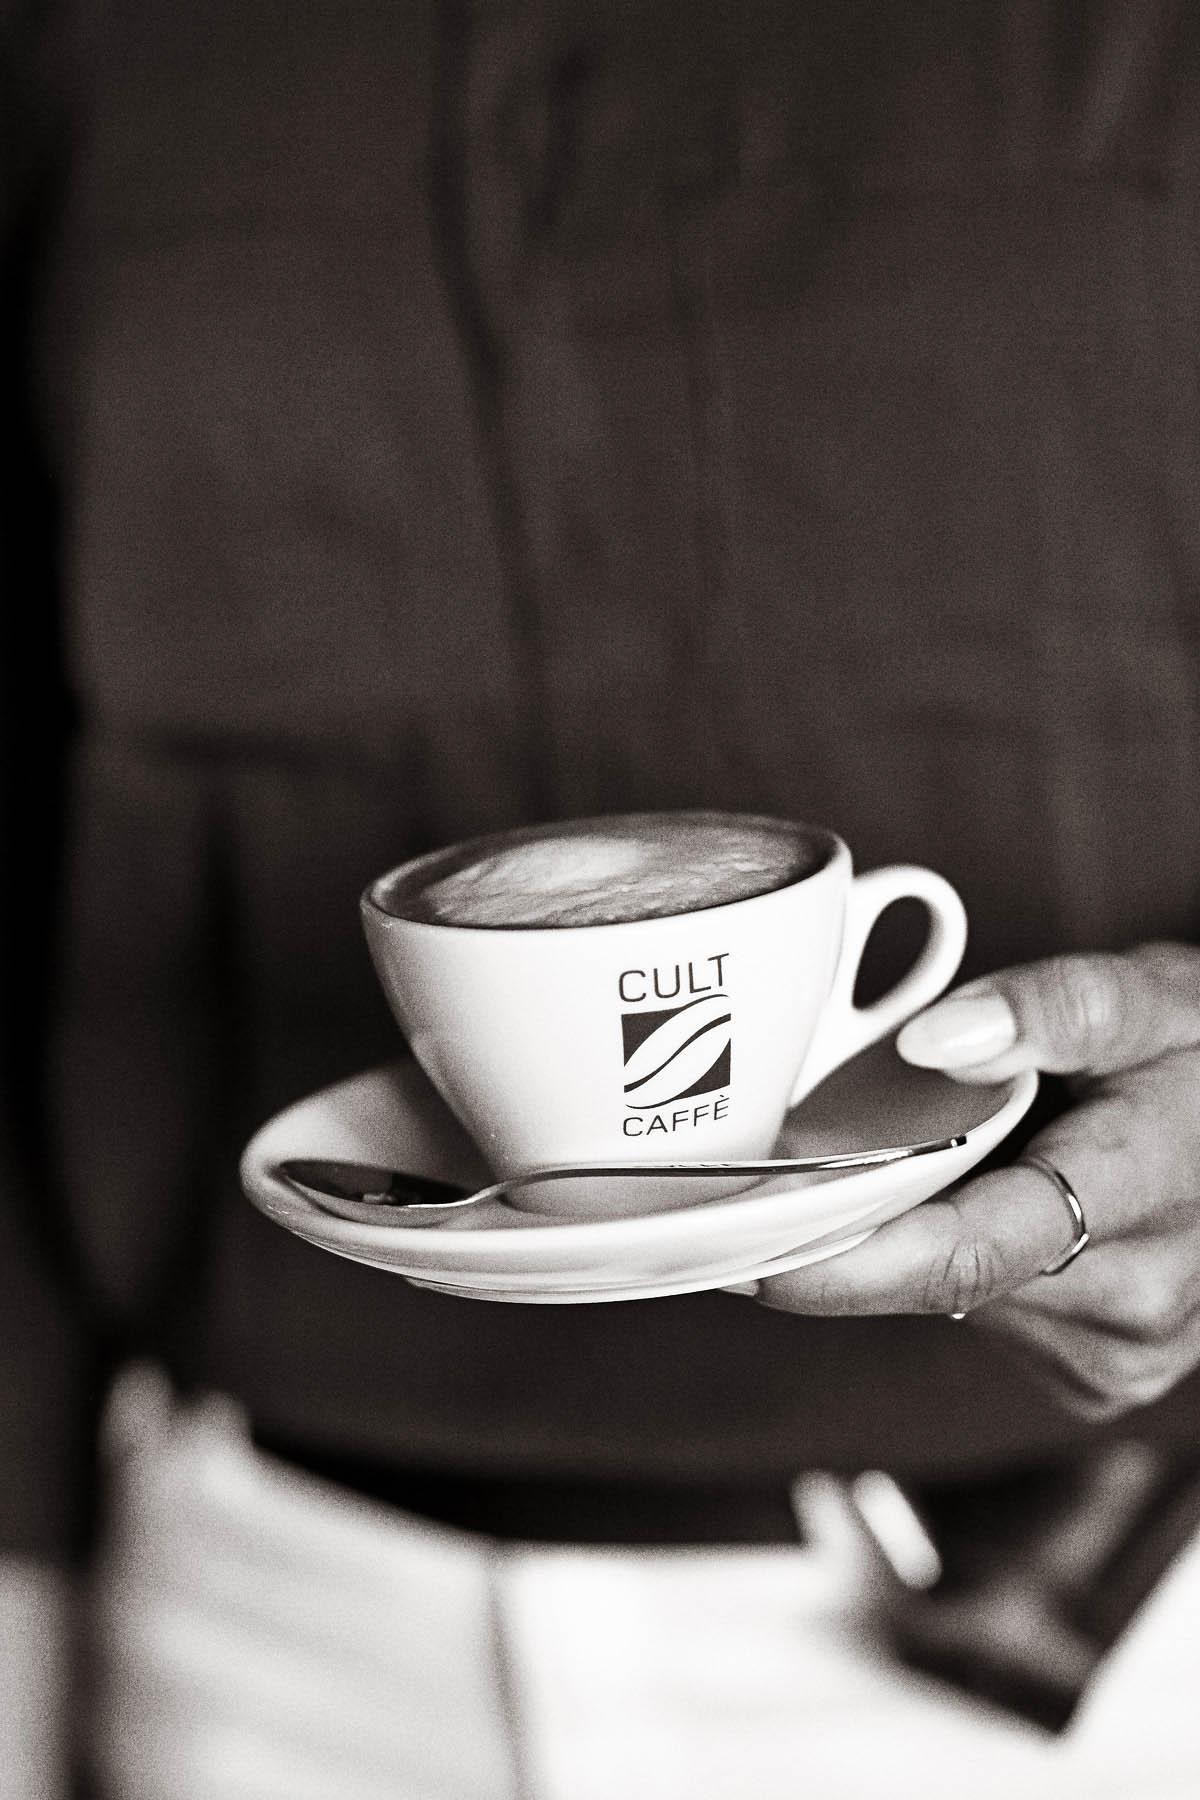 Cult-Caffe-Sappert-Auftragsfoto-at_ _MG_9870